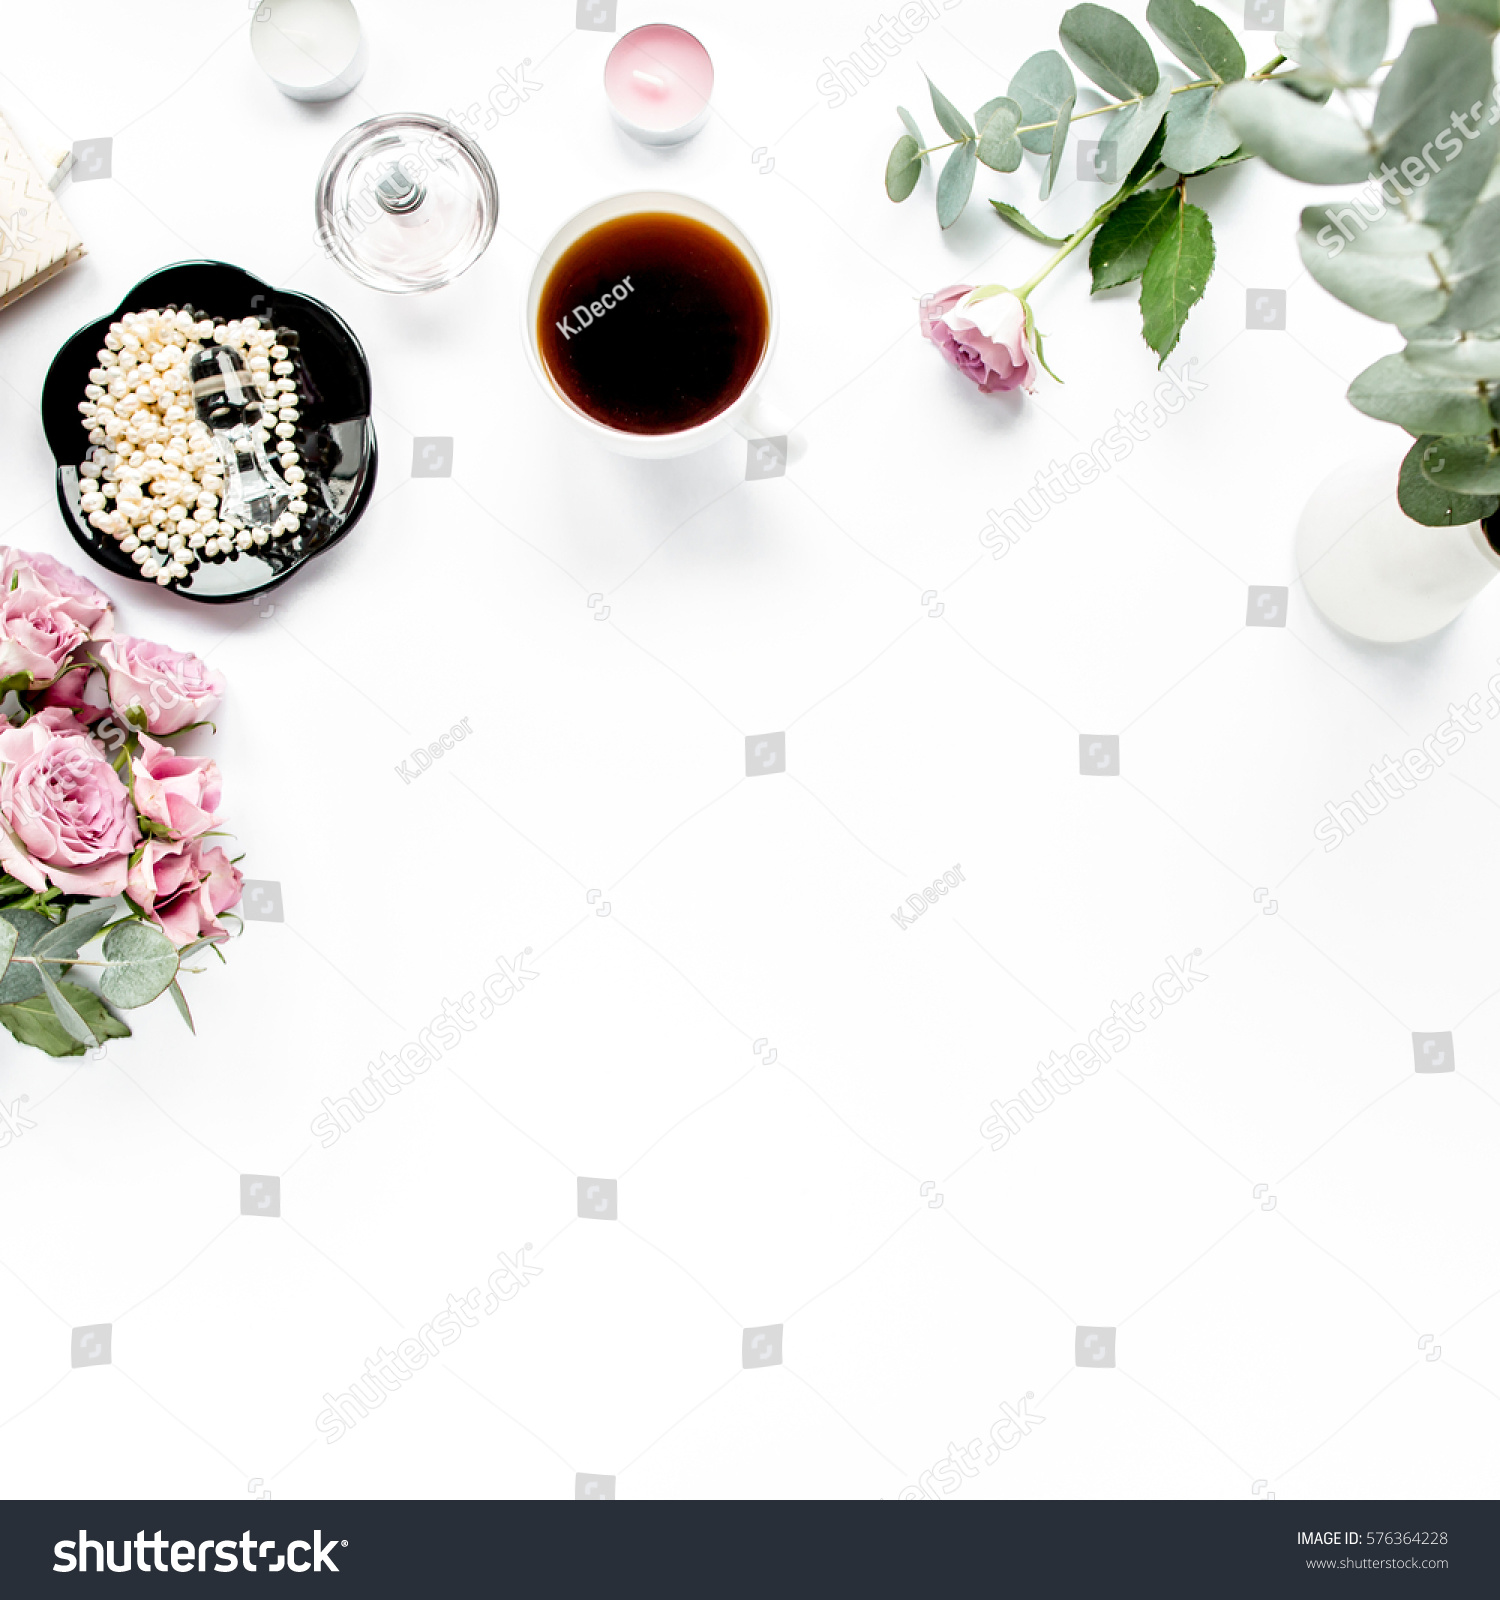 reviravoltta com ideas up everywhere women womens darling dalmatian accessories is desk s print alert this trend spice of